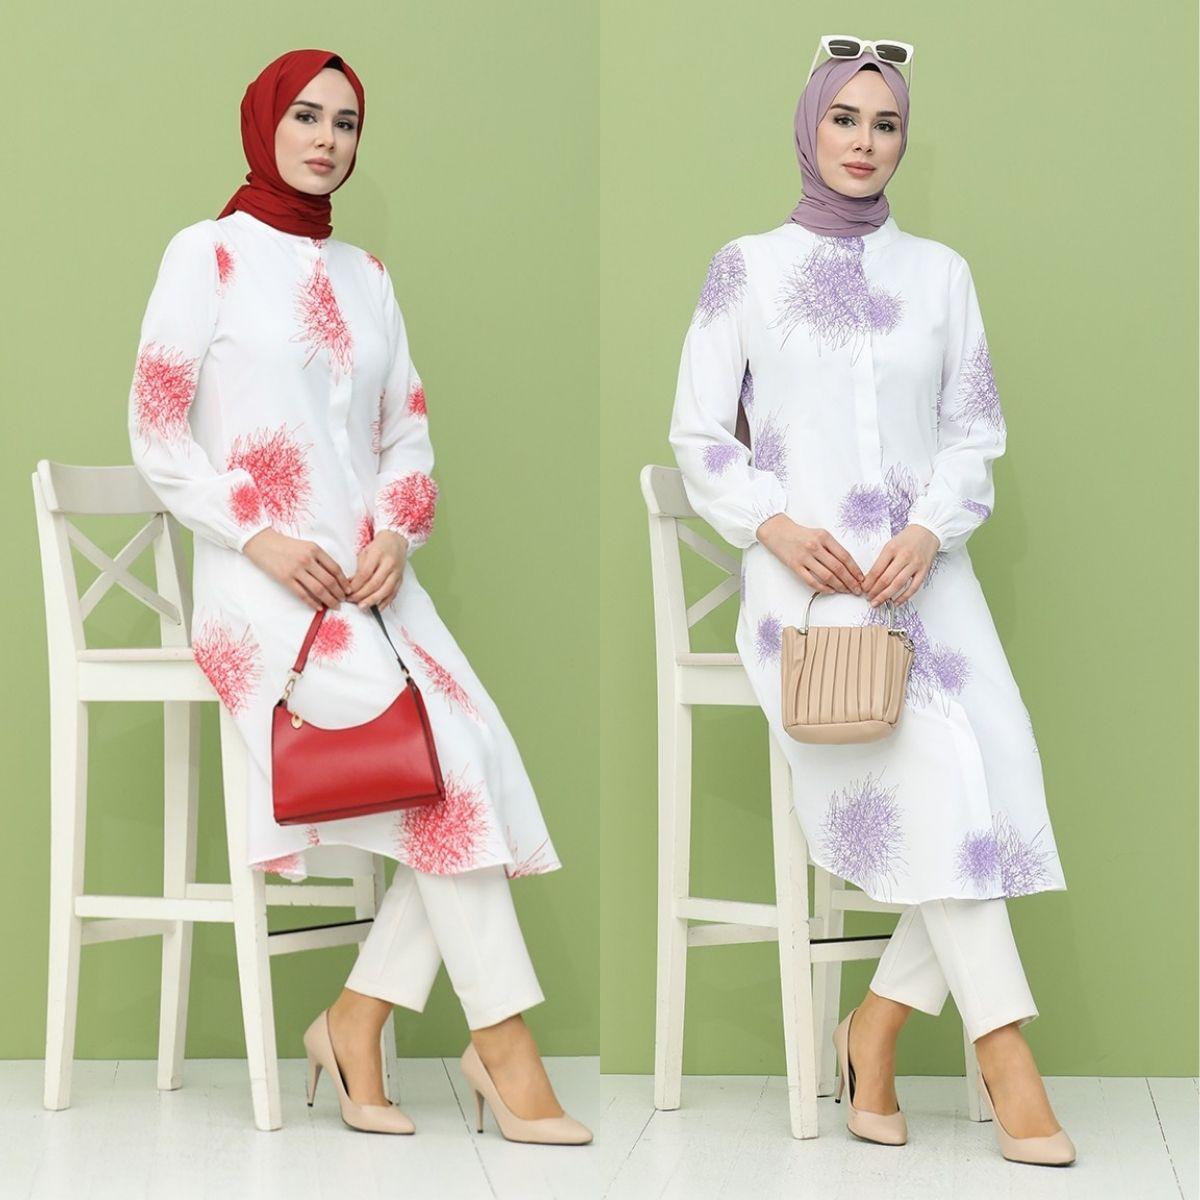 Patterned Tunic Polyester Fabric Cotton Hijap Hidden  Button  Unlined  Long Sleeve Shirt Collar Seasonal  Women  Muslim Fashihon